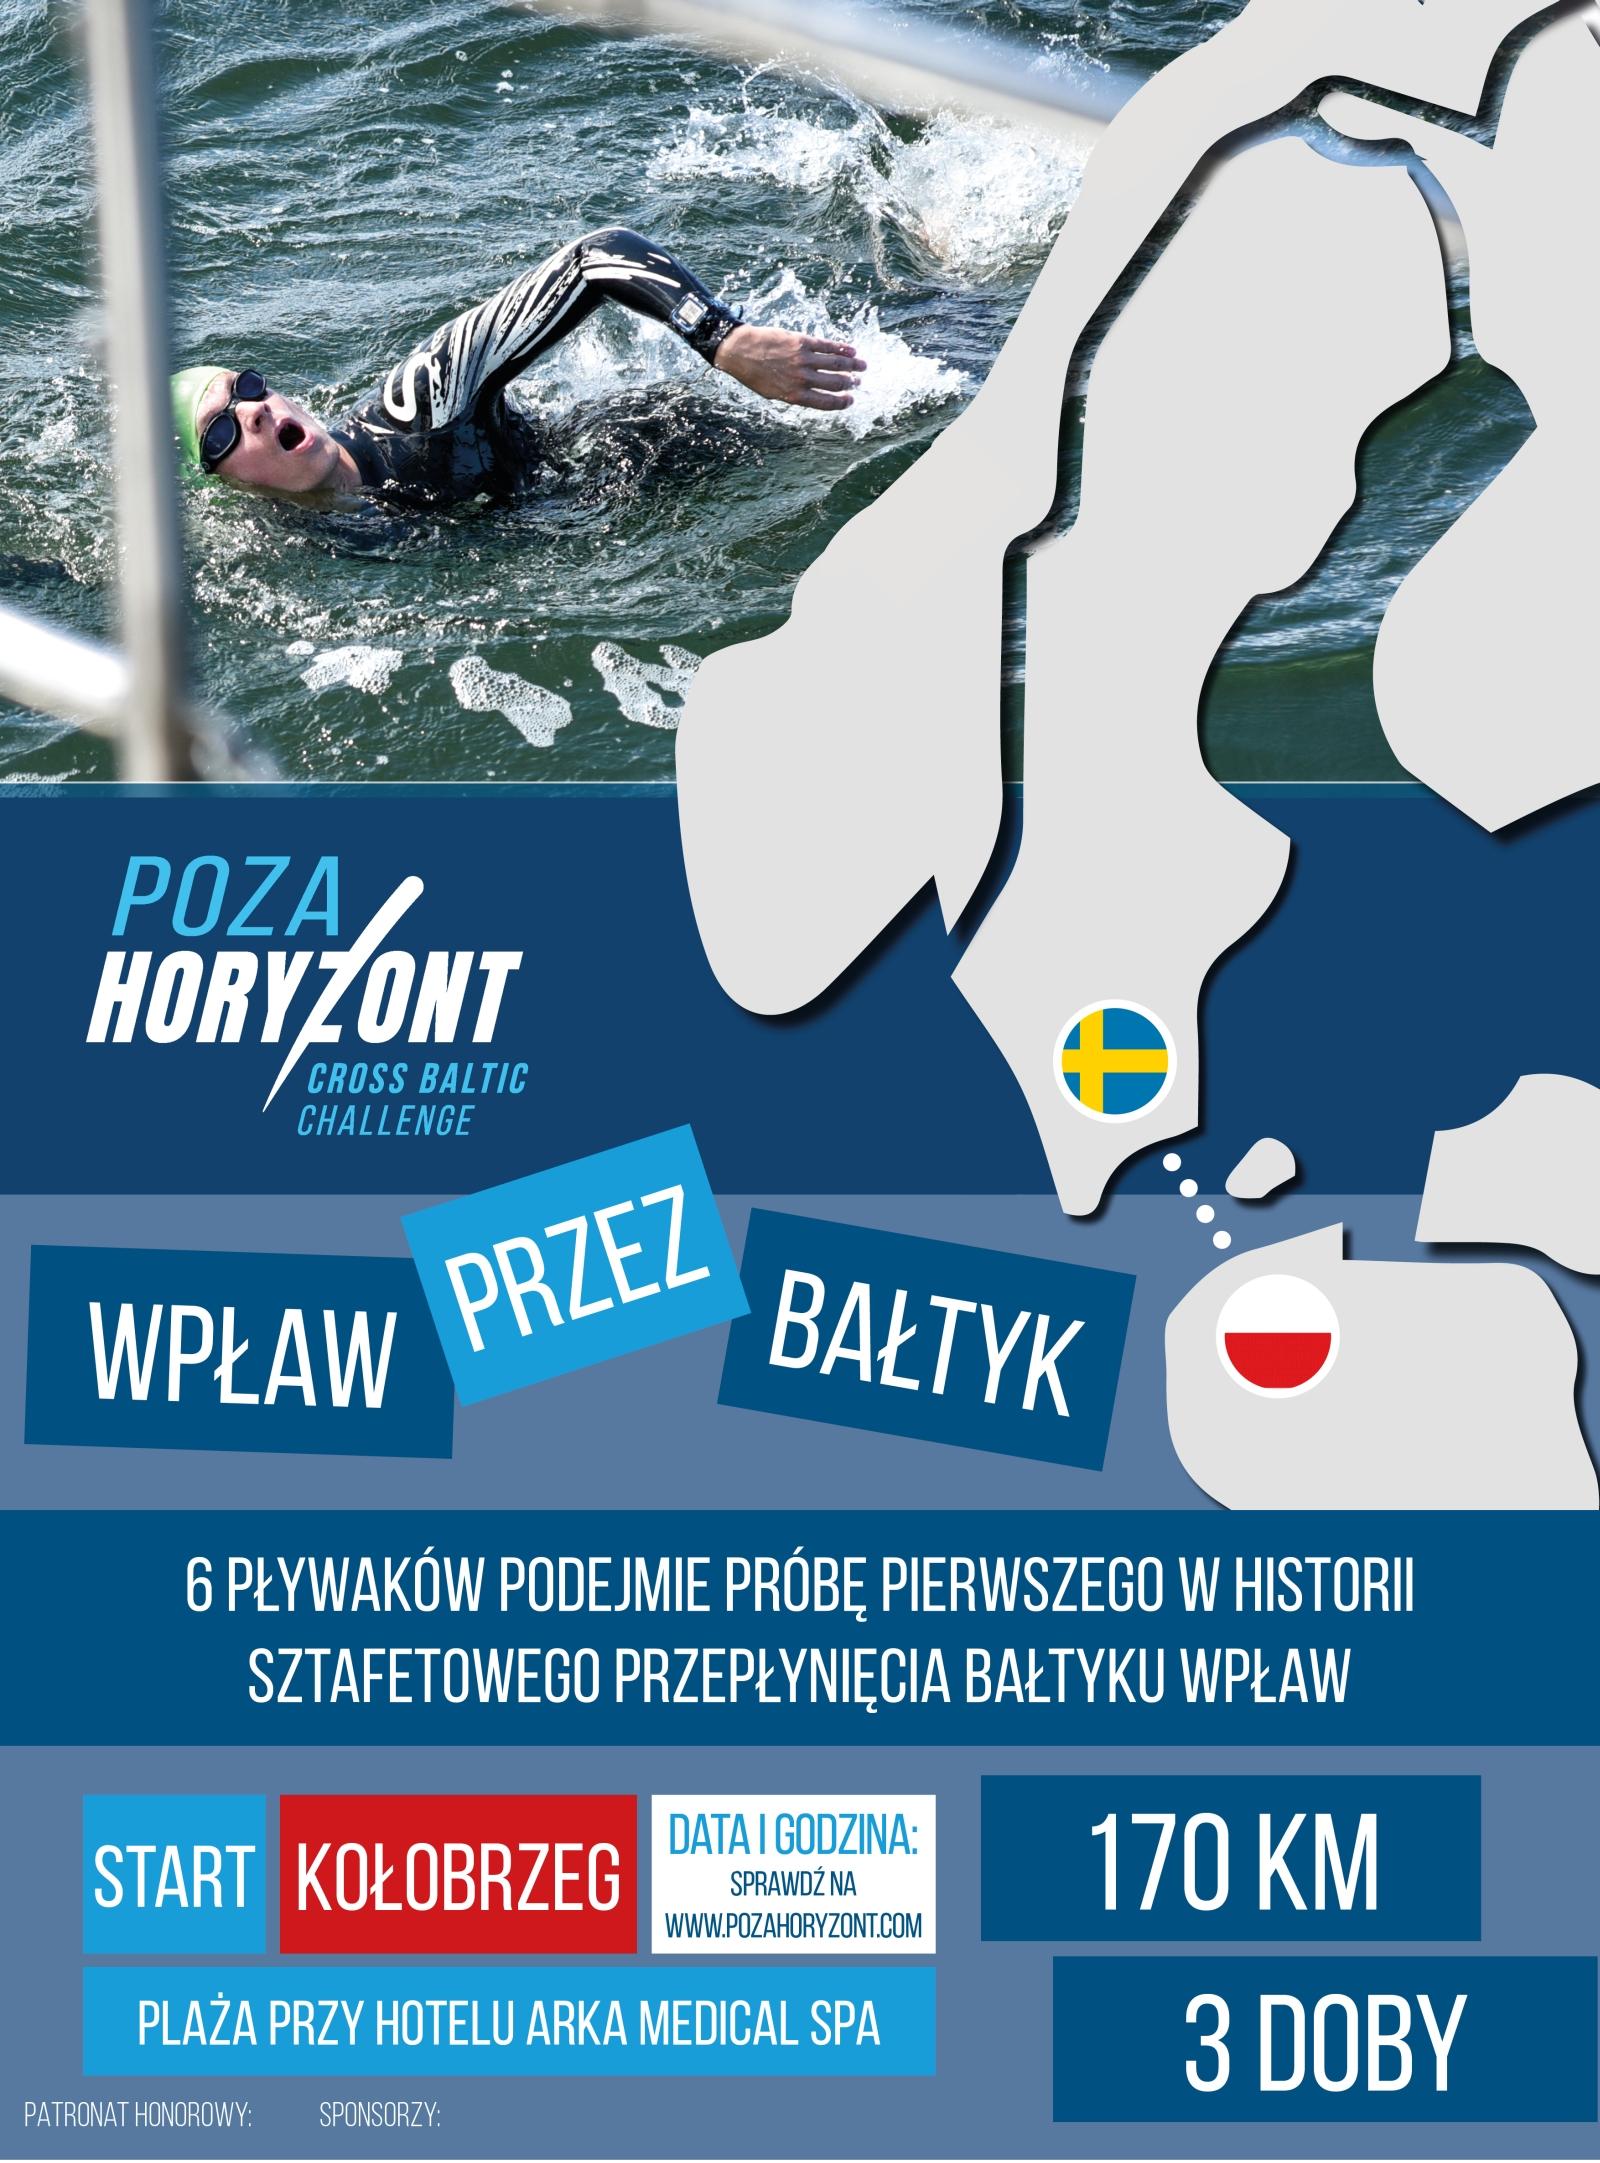 polska sztafeta Bałtyk wpław